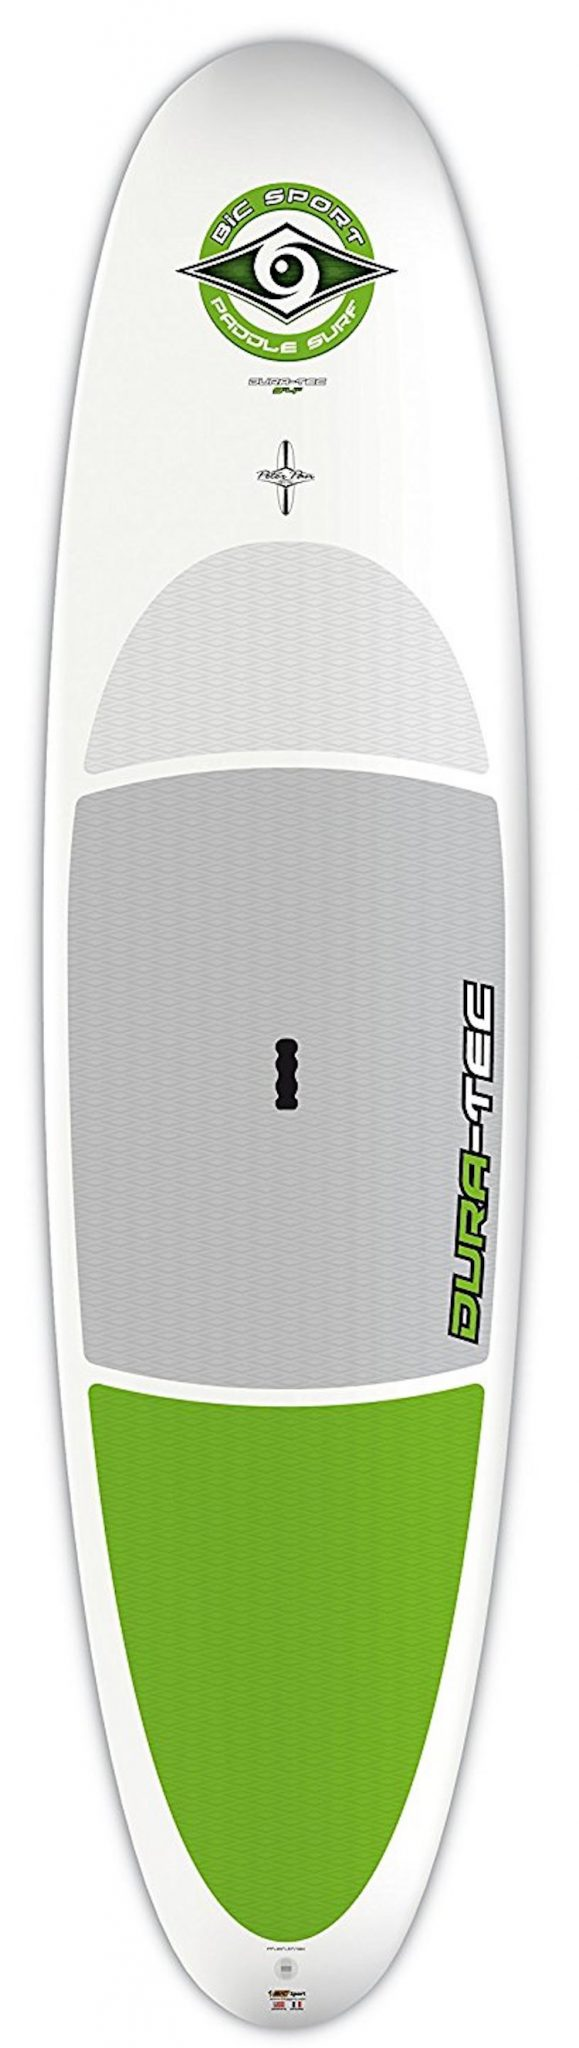 BIC Sport DURA-TEC Original Stand up Paddleboard